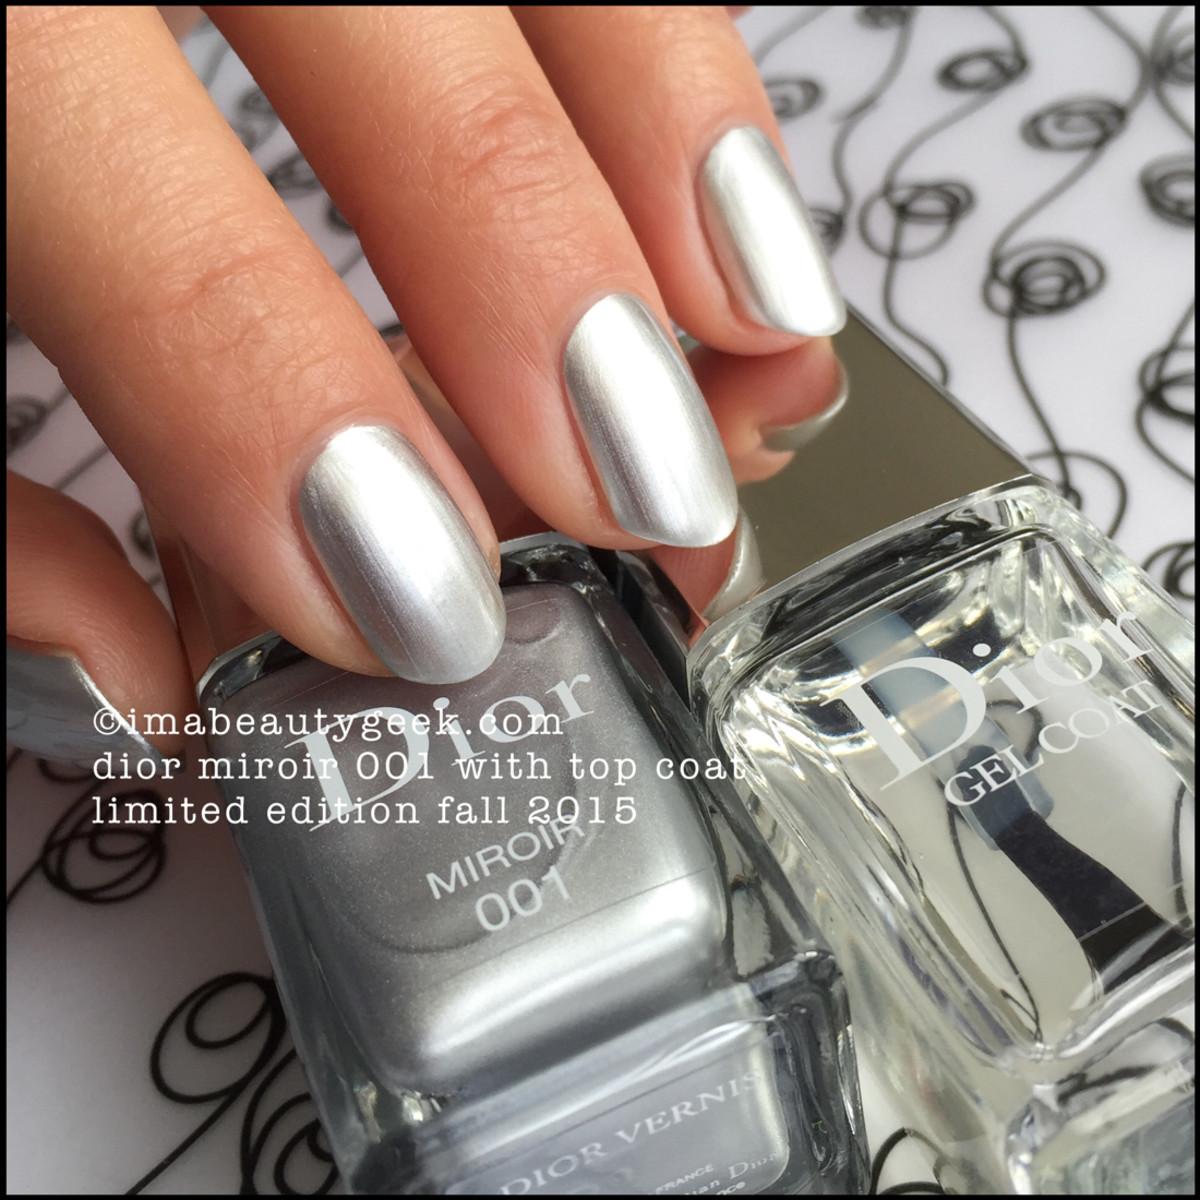 Dior Miroir 001 Vernis Nail Polish Fall 2015 Cosmopolite